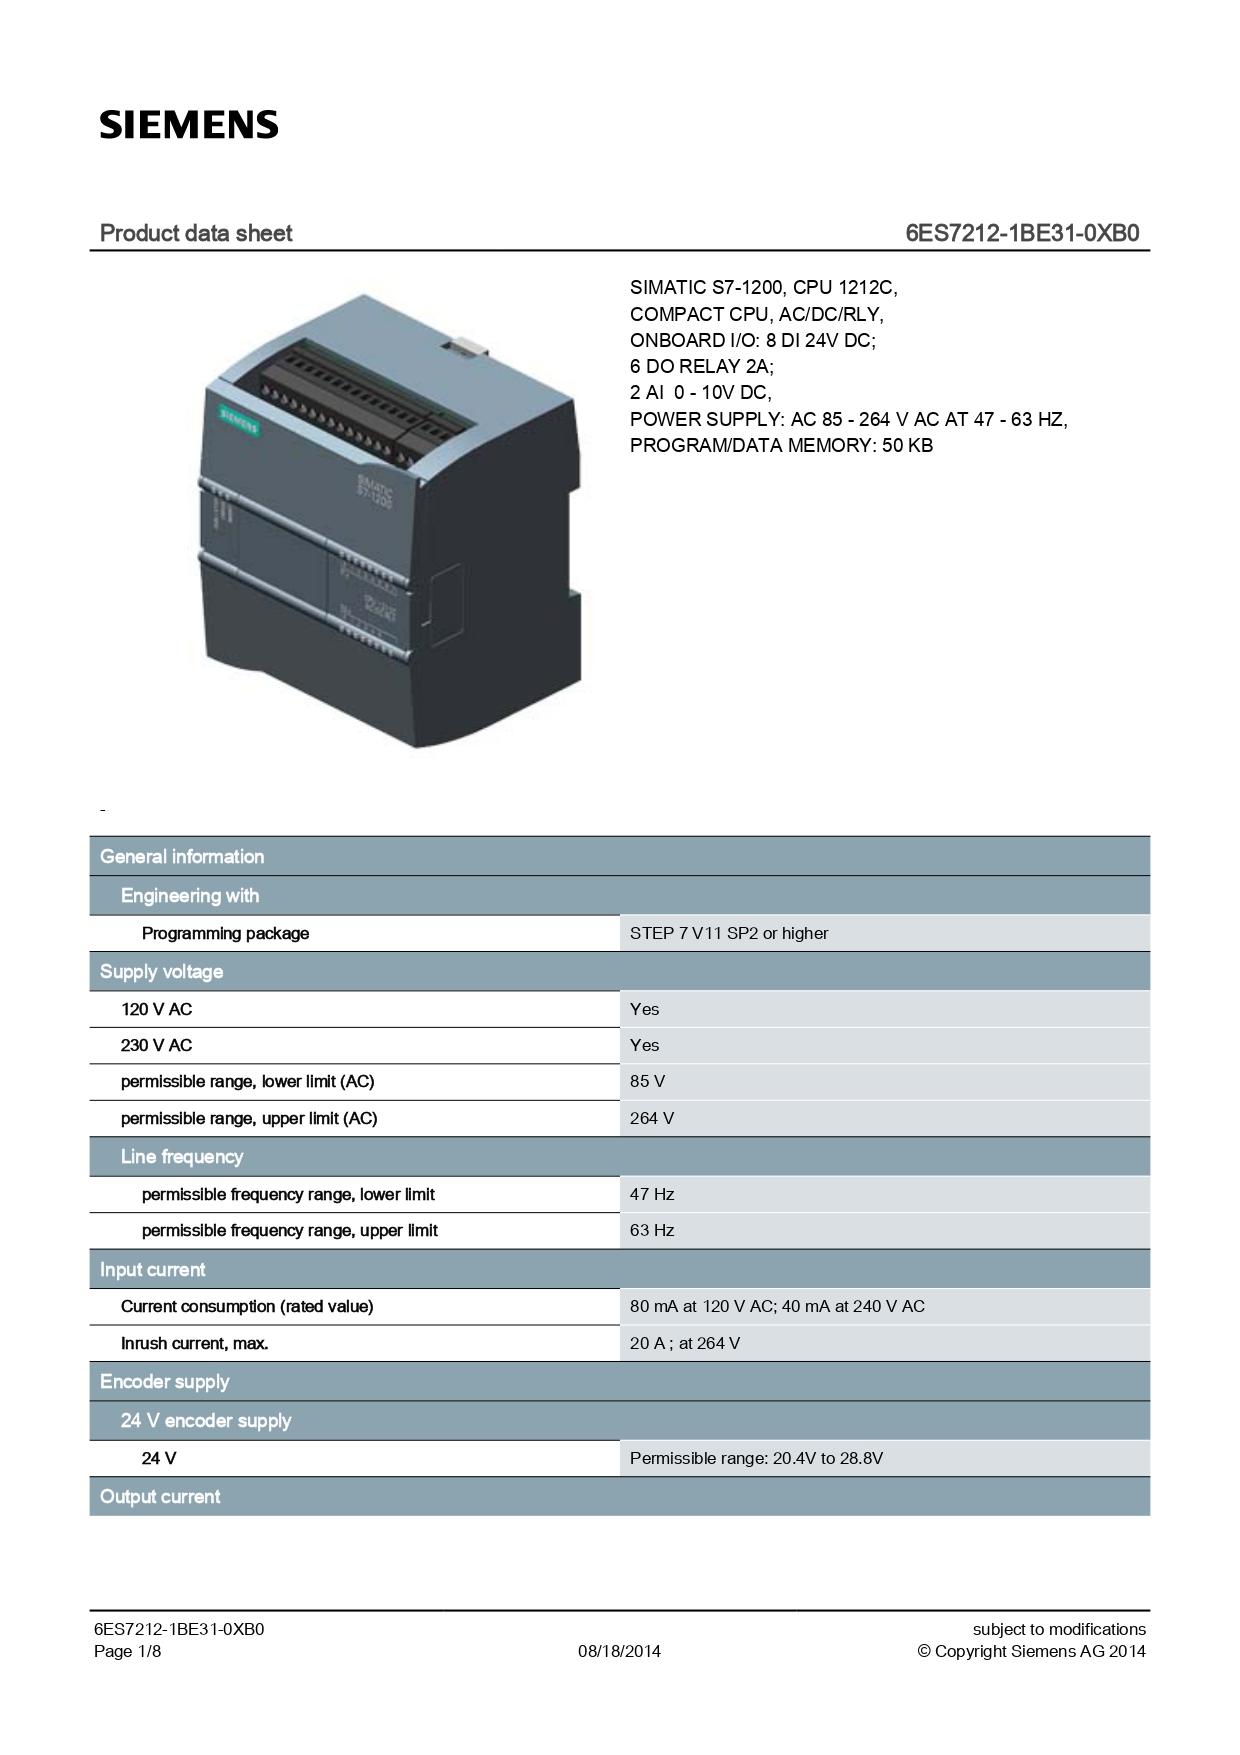 6ES7212-1BE31-0XB0_datasheet